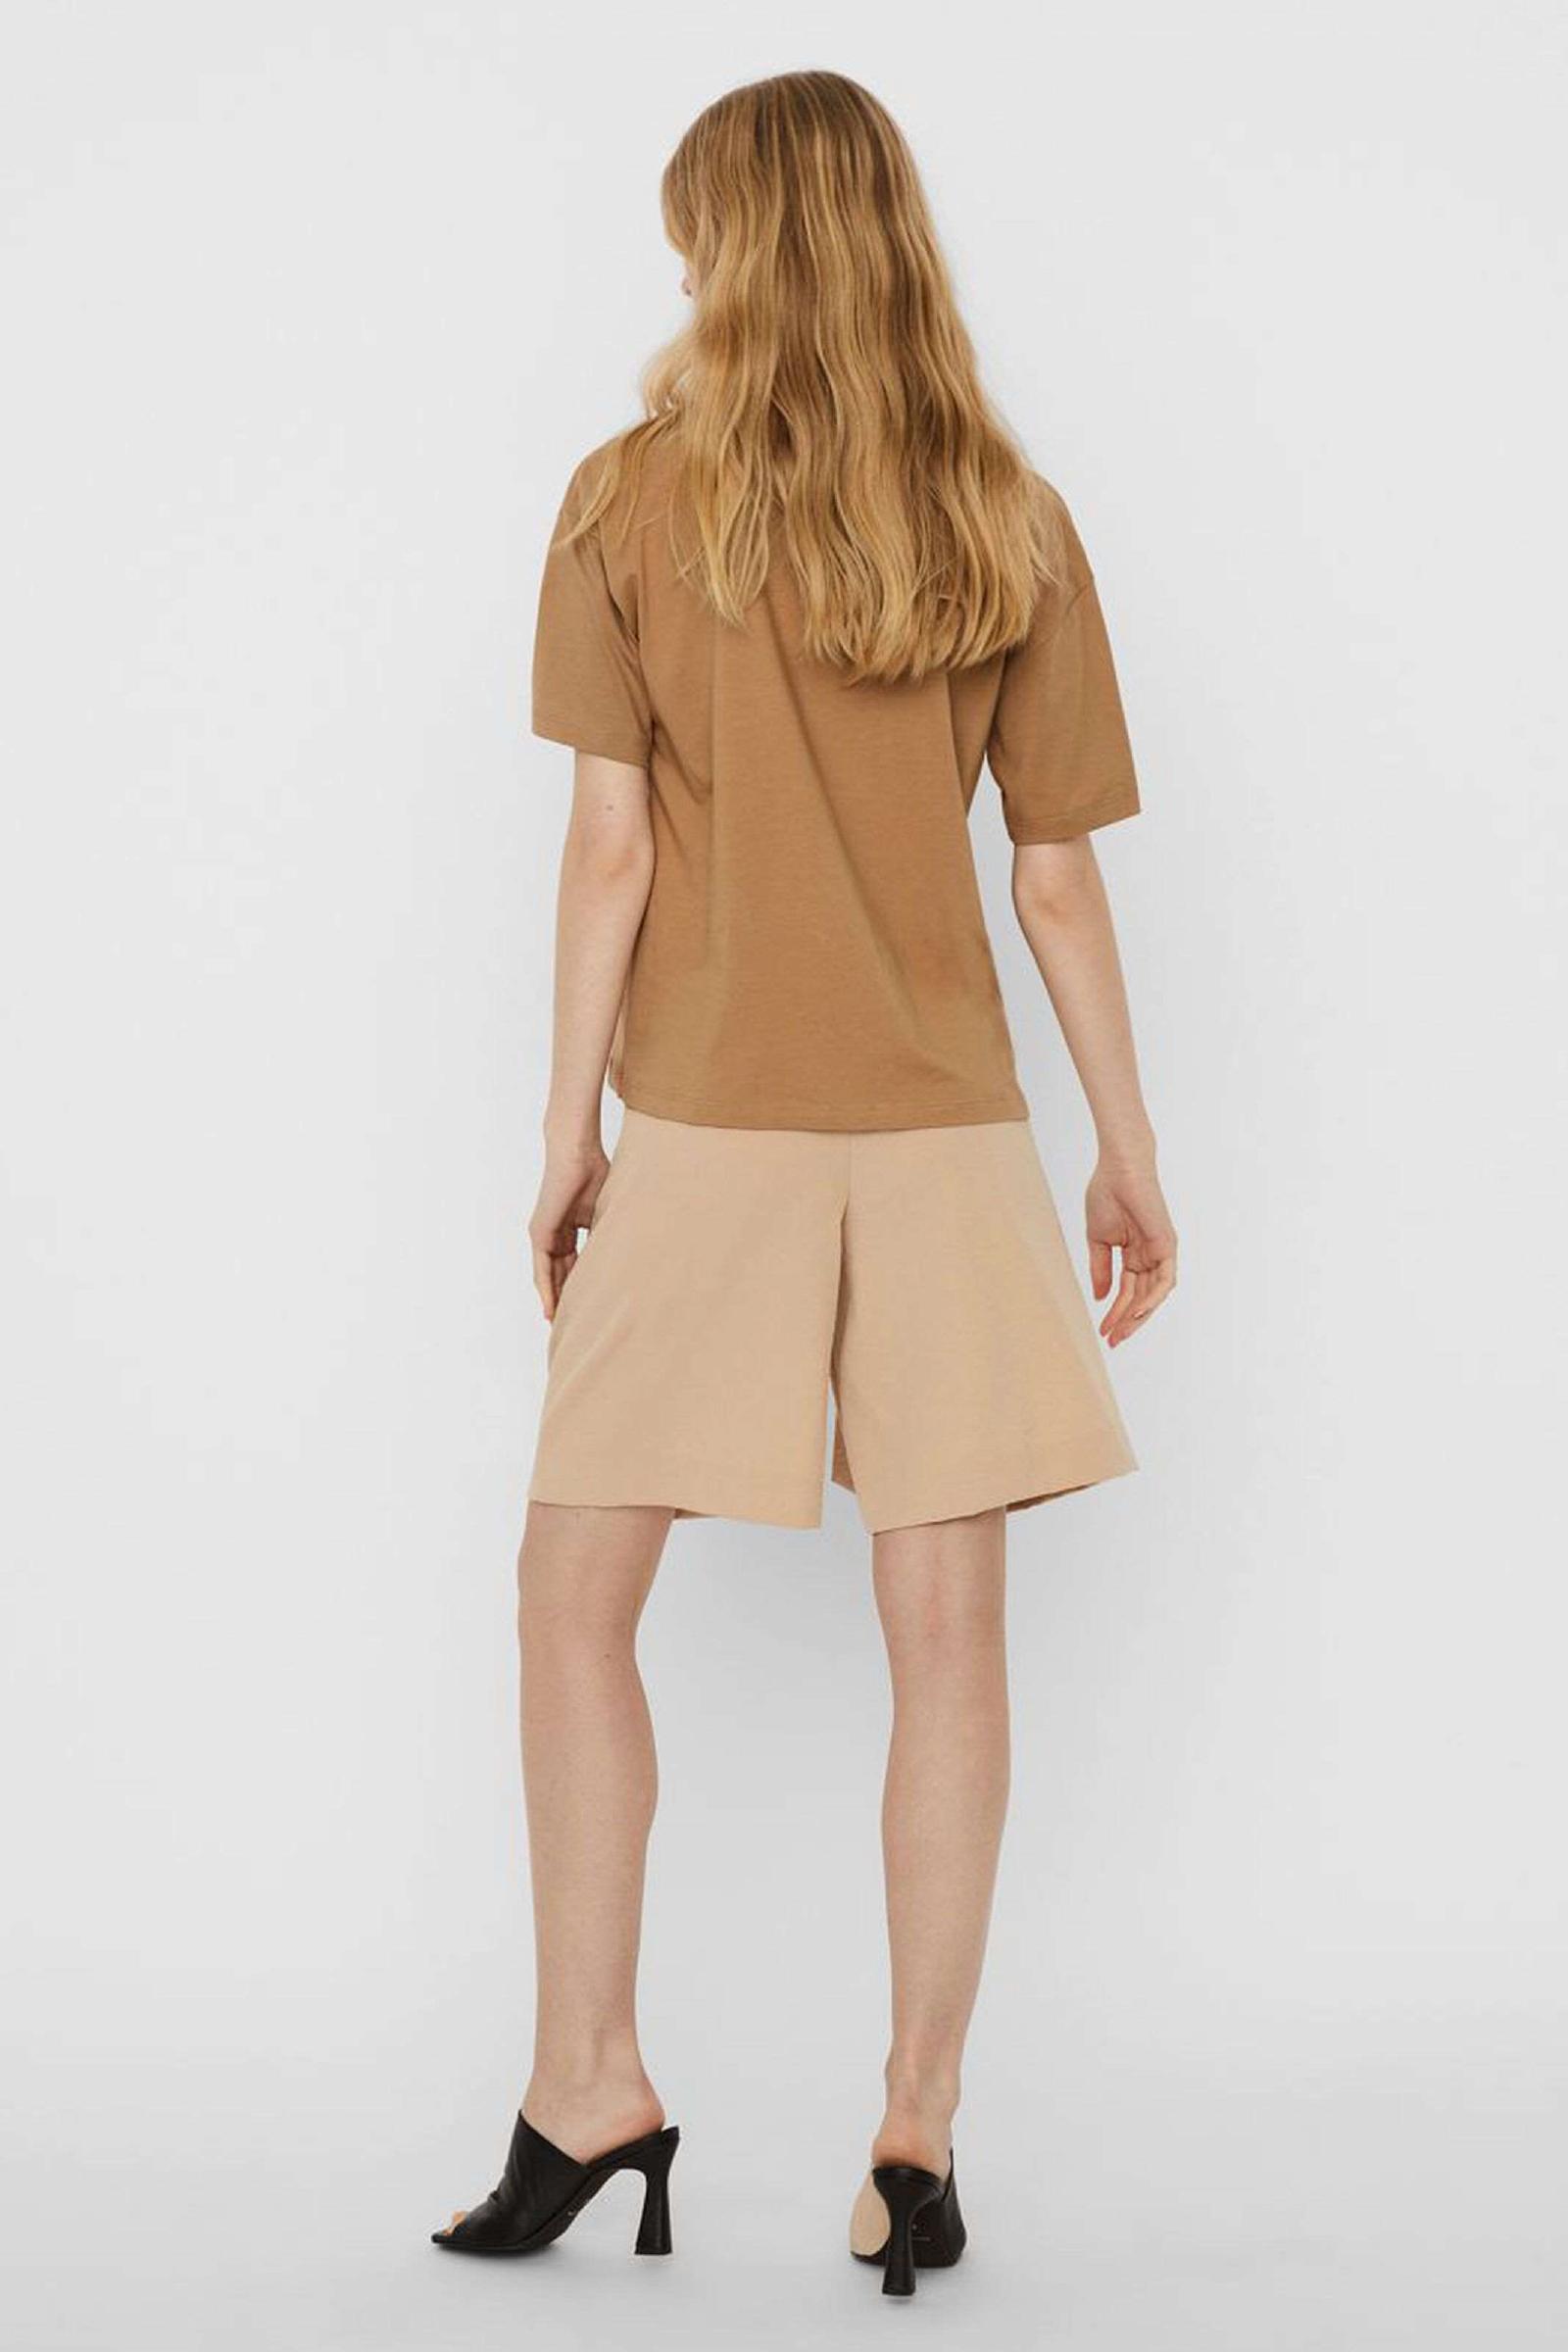 VERO MODA T-SHIRT Donna Modello MAGIC VERO MODA | T-Shirt | 10235139TIGER EYE